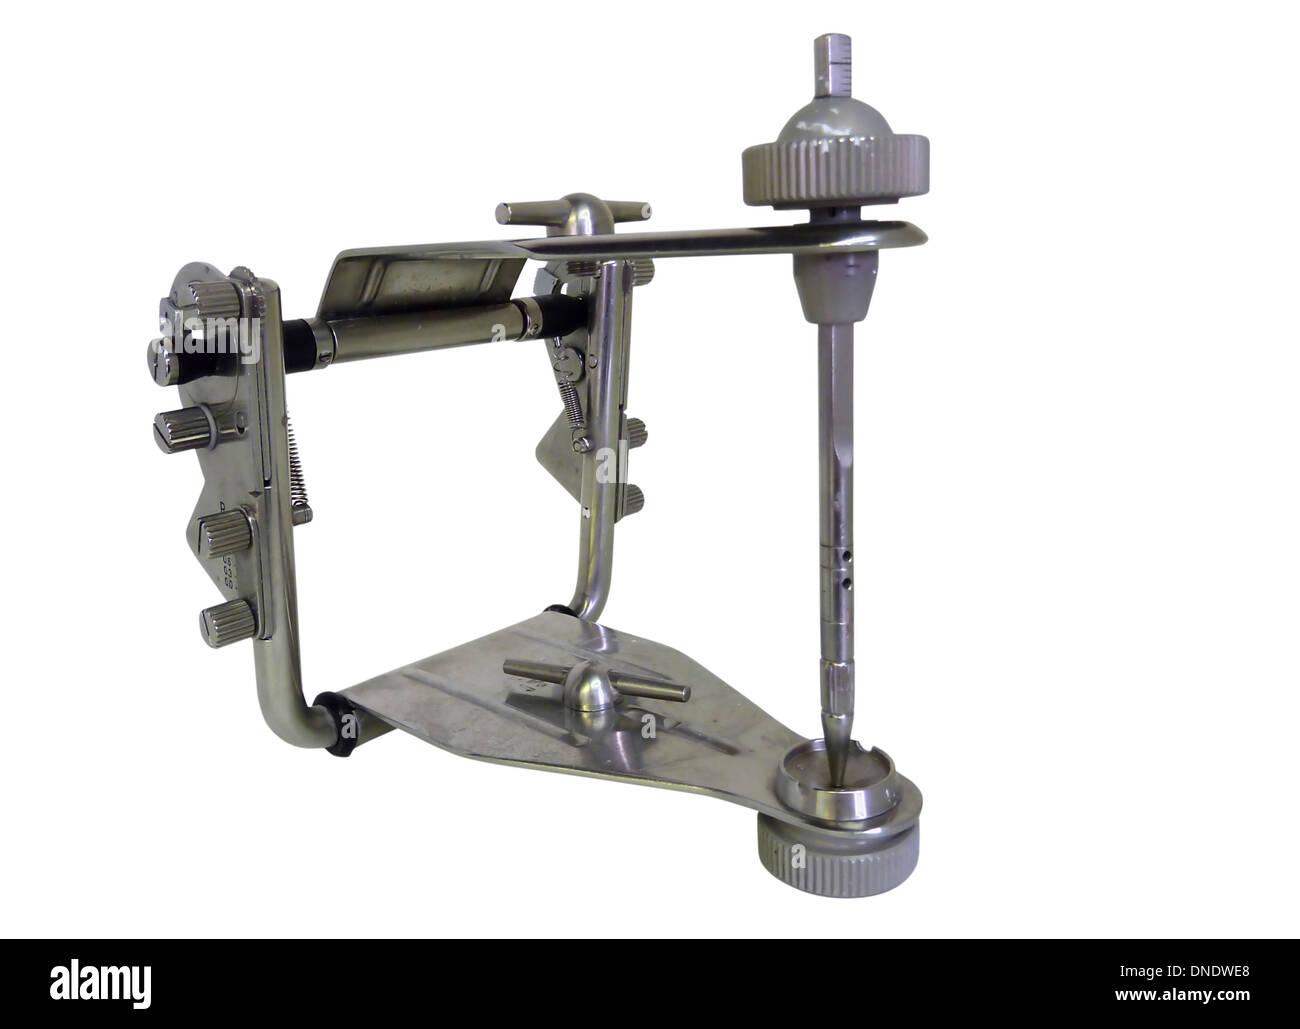 Grey metallic articulator used in dentistry. - Stock Image